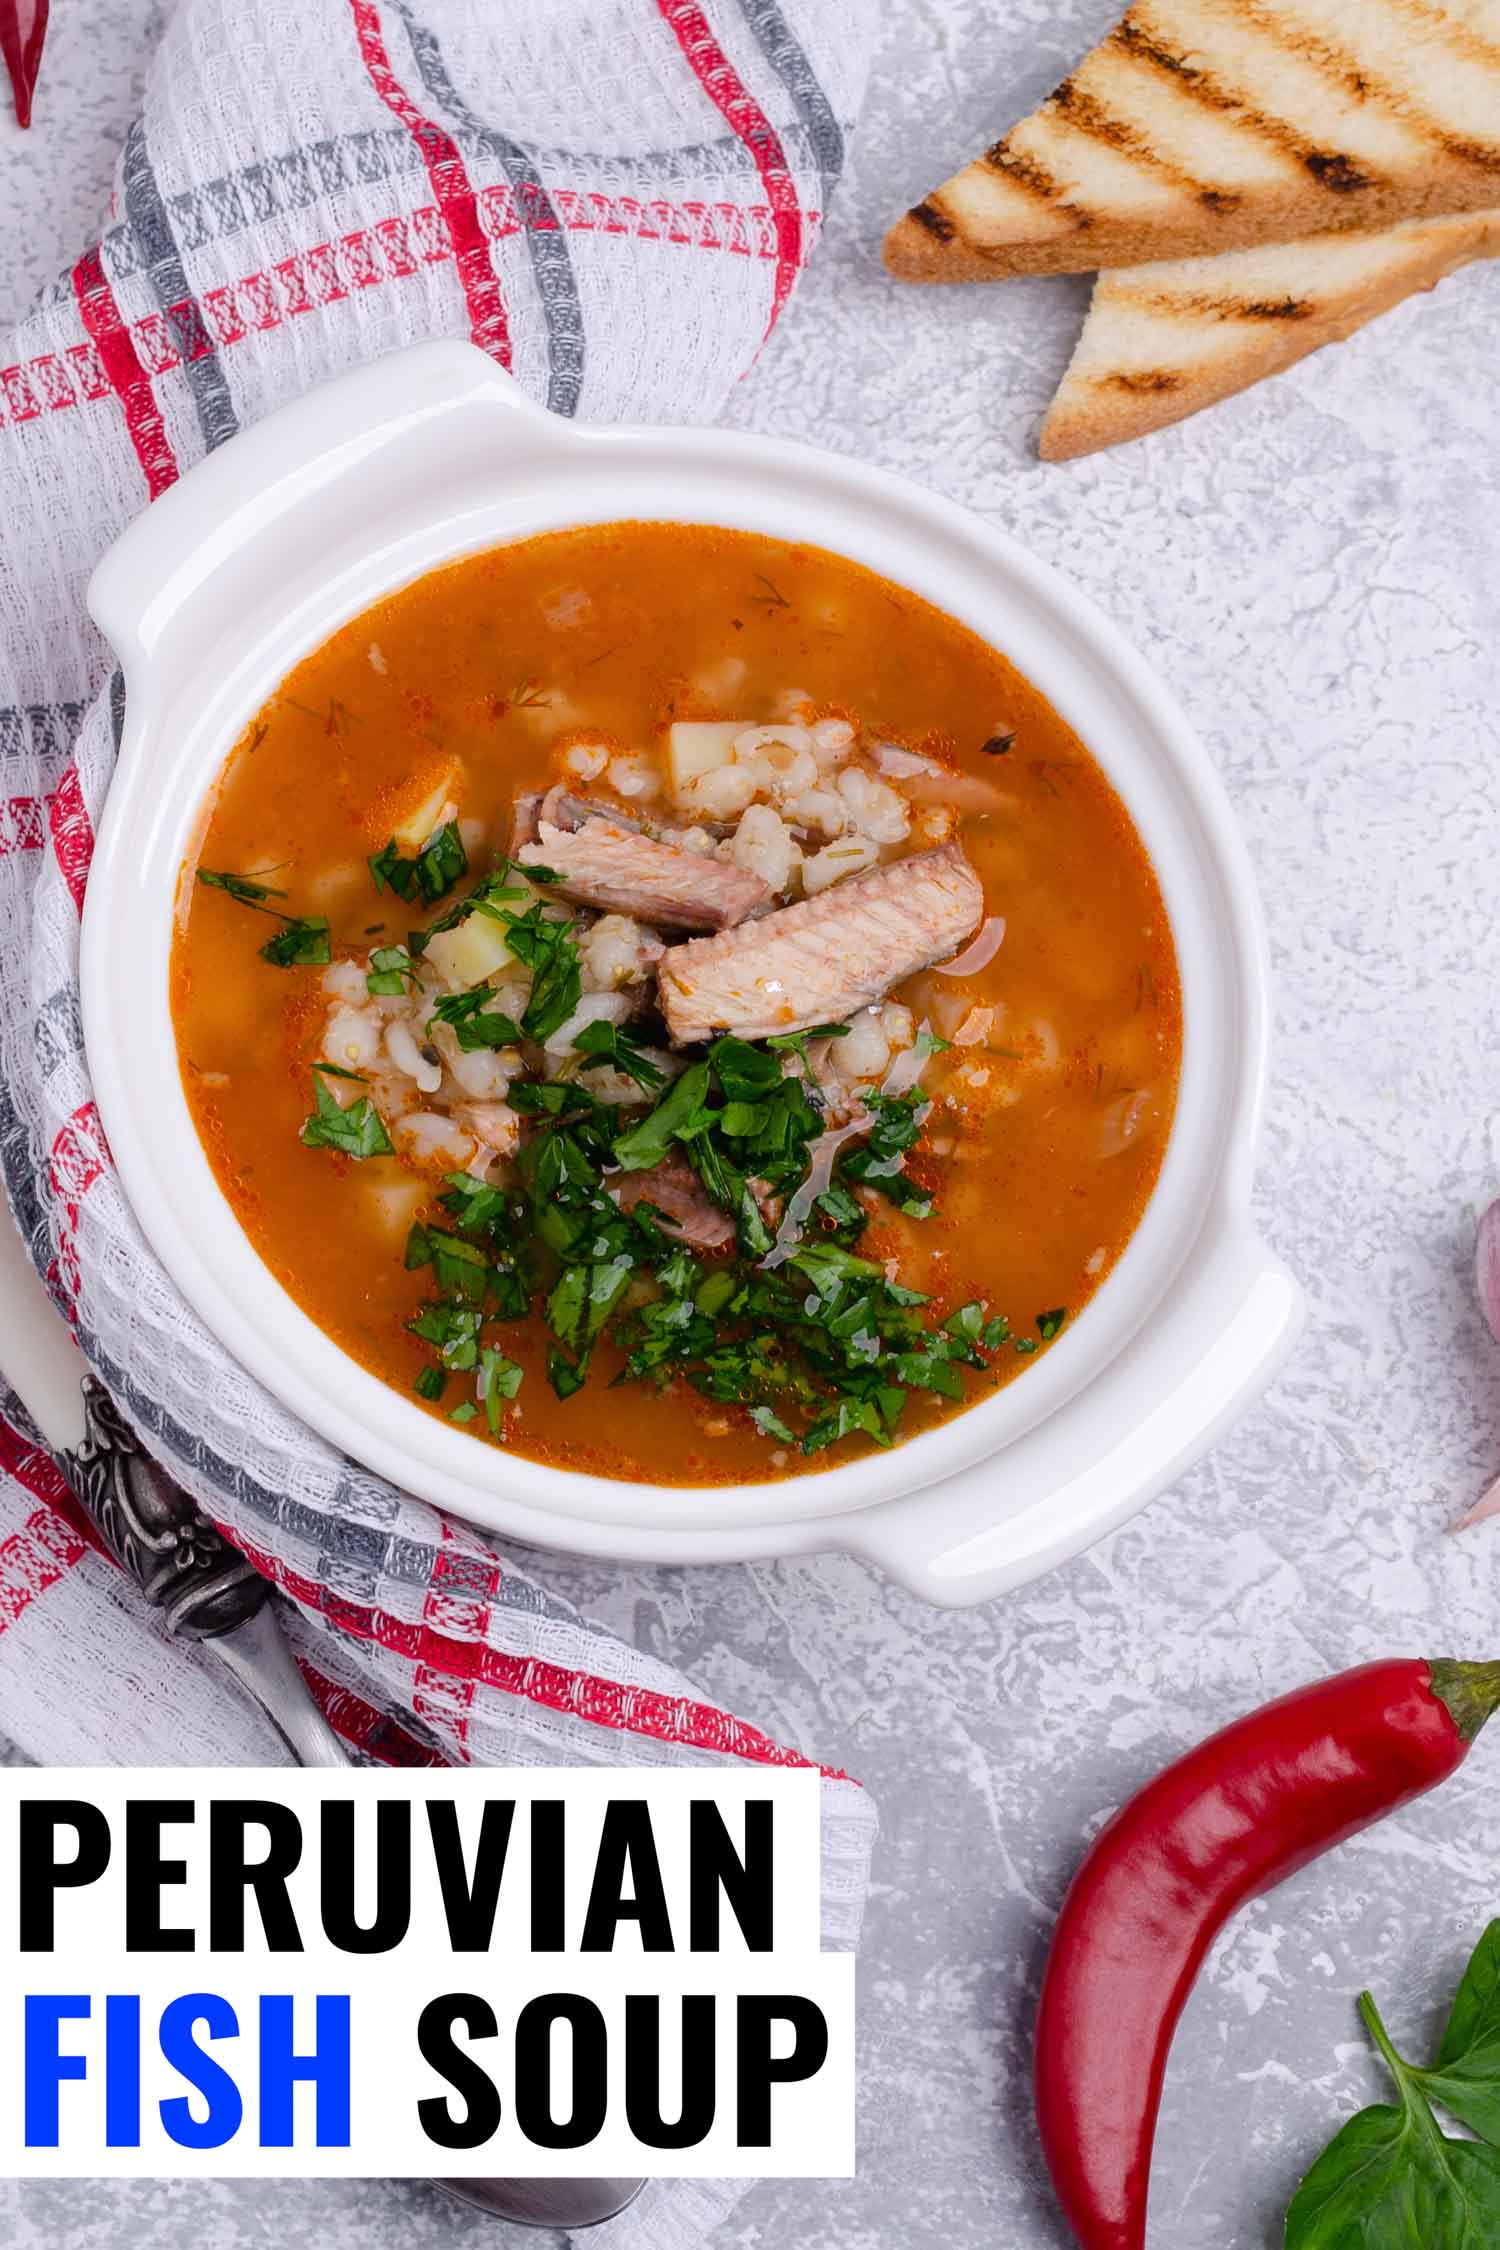 Peruvian fish soup called sudado in a white bowl.